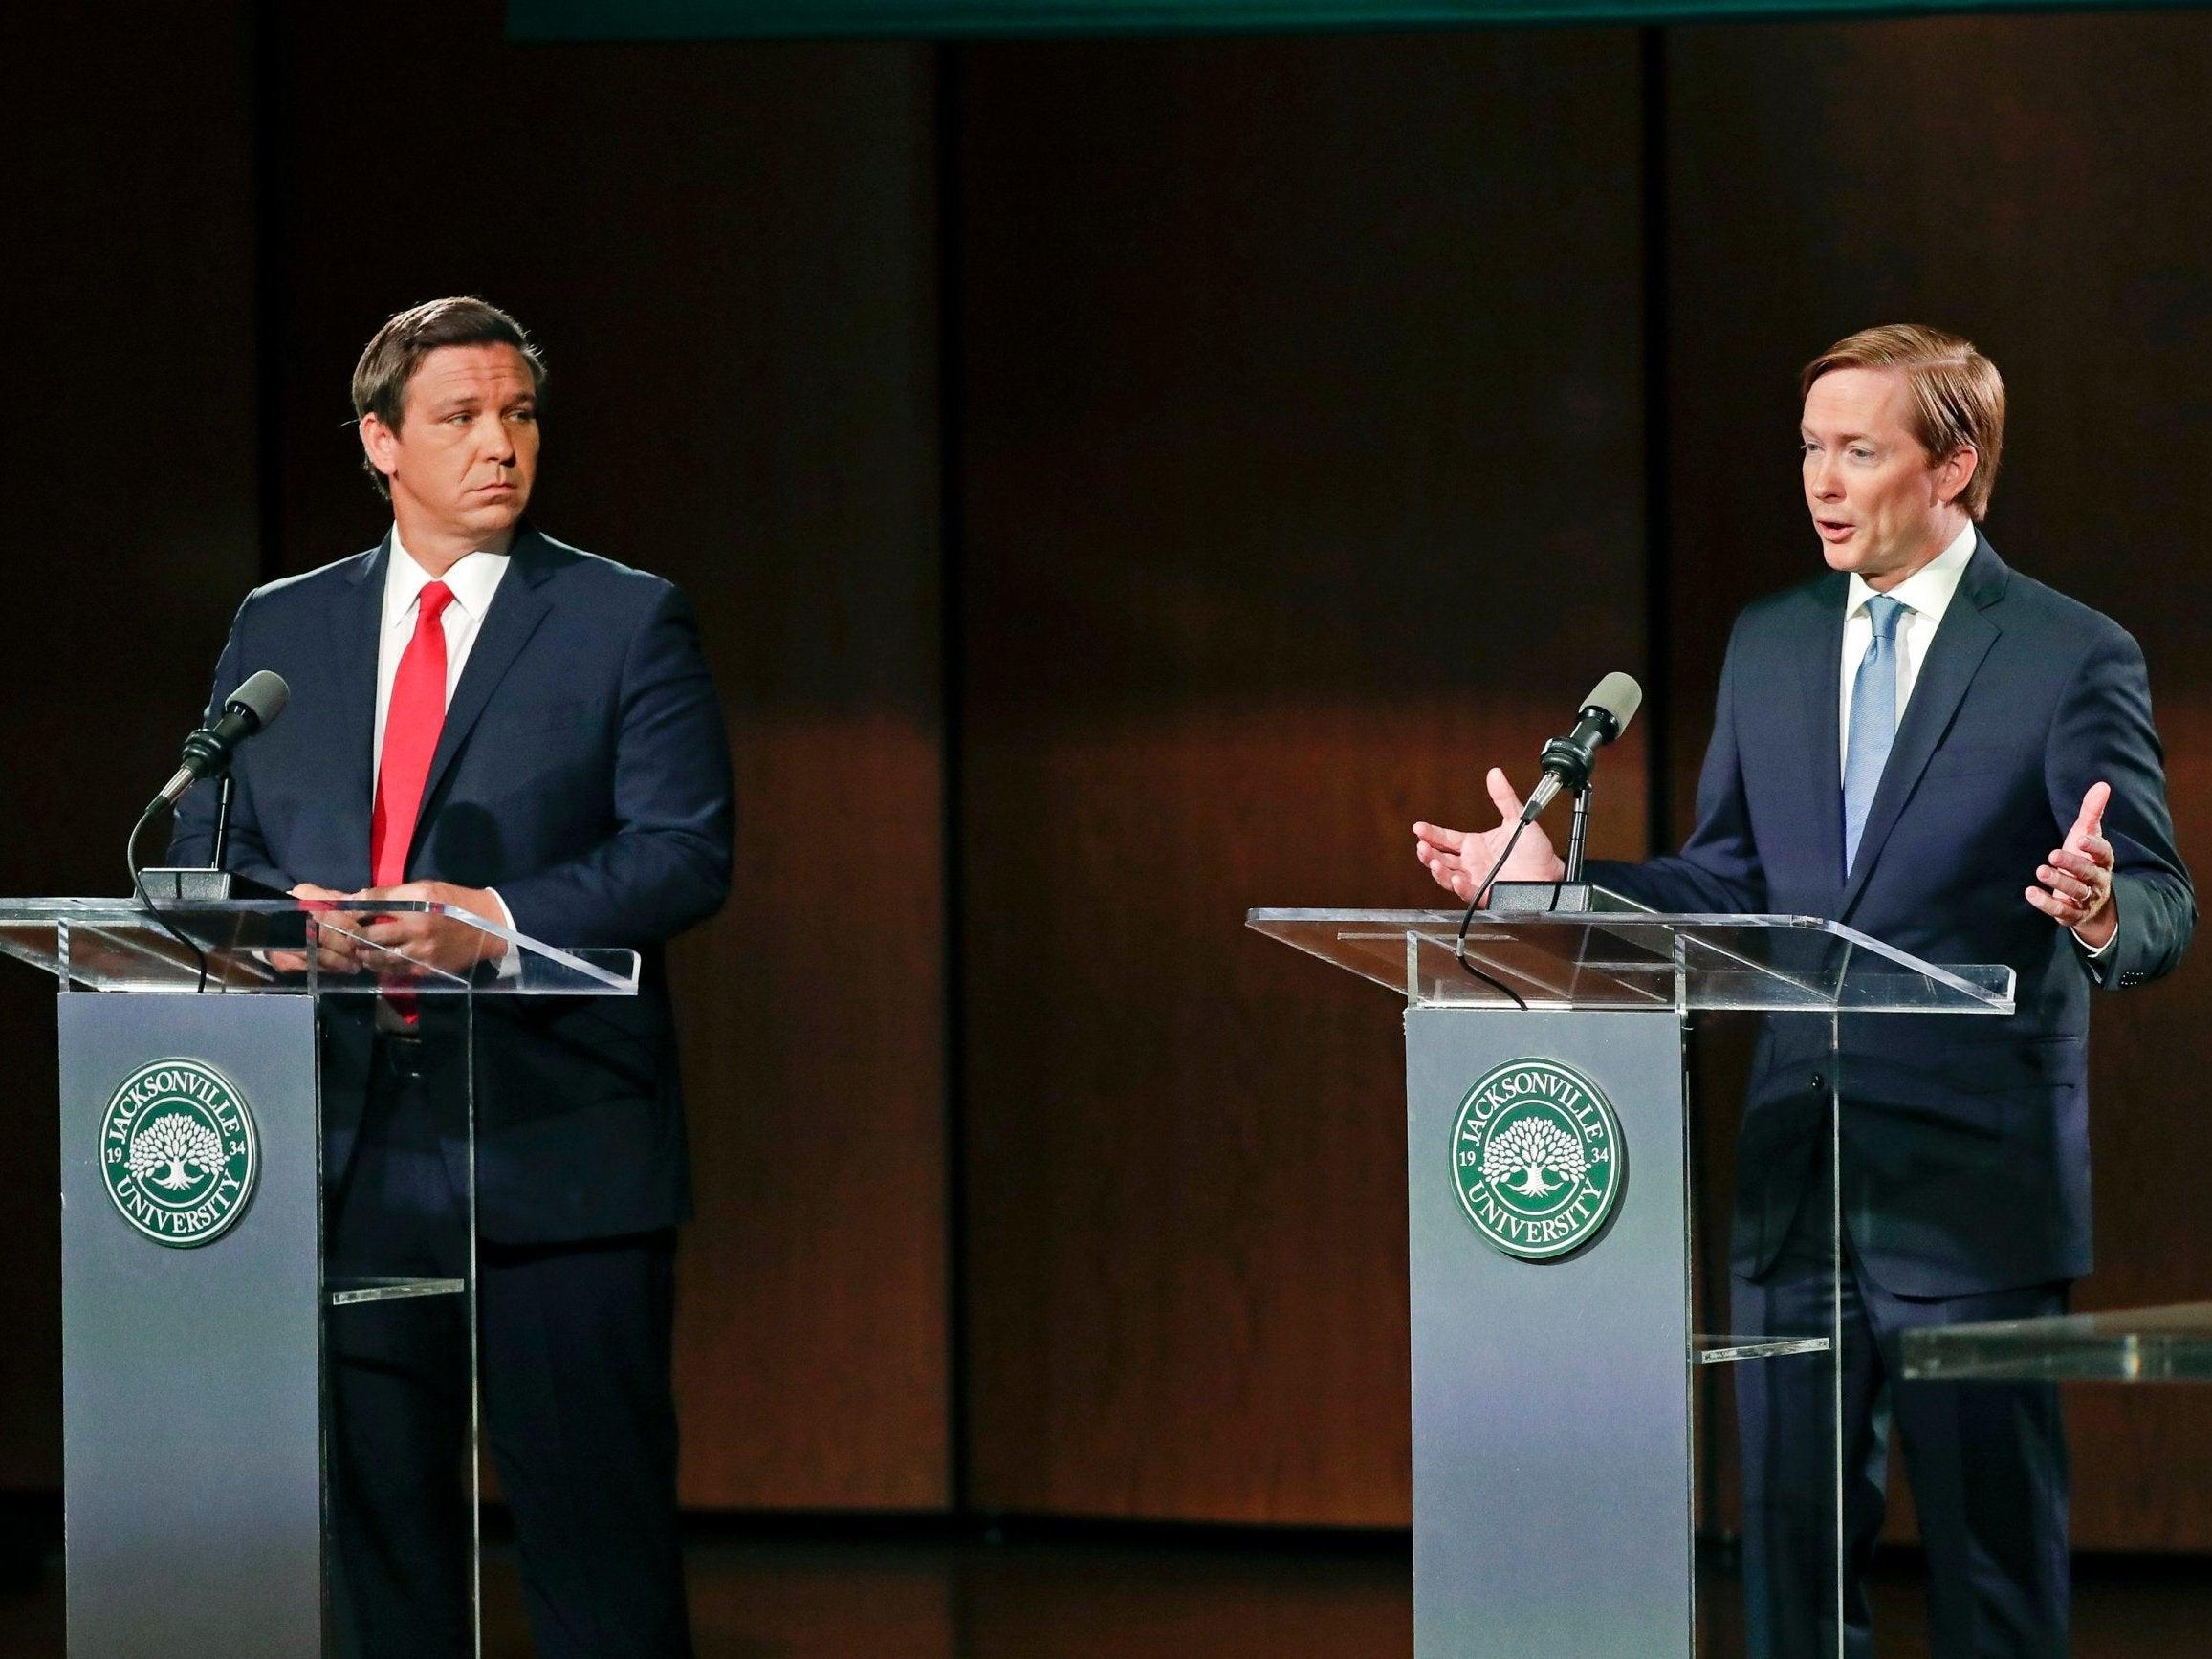 Florida, Arizona and Oklahoma primaries 2018: Who are the candidates?